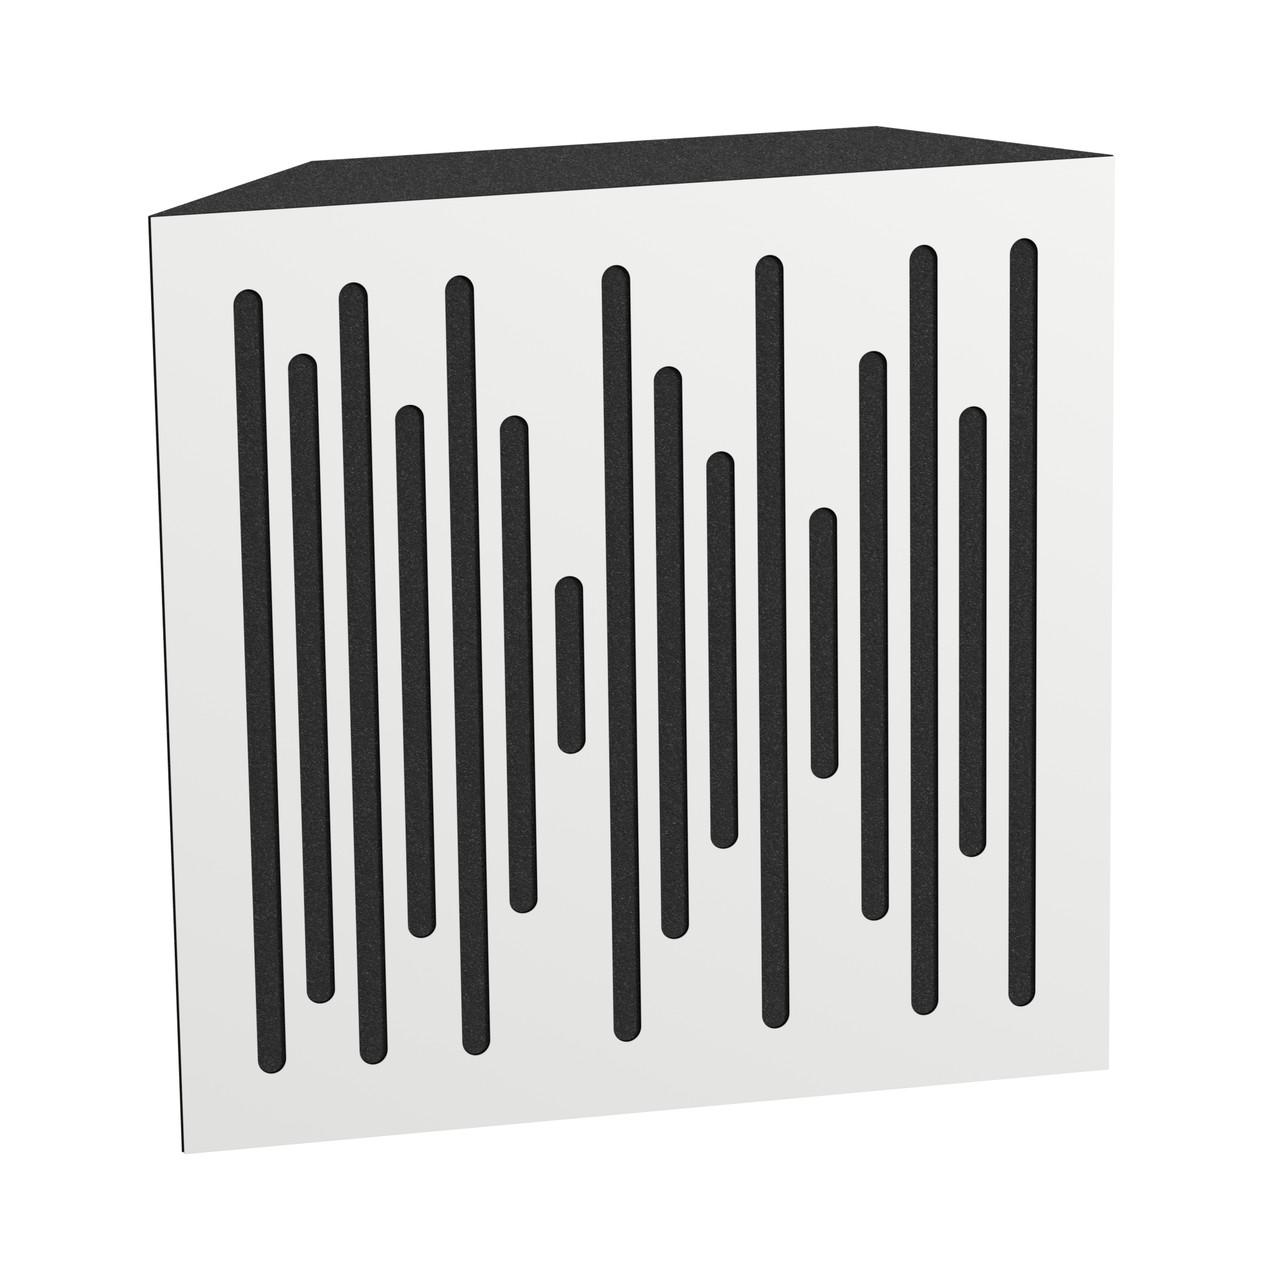 Бас пастка Ecosound Bass trap wood 500х500х150 колір білий